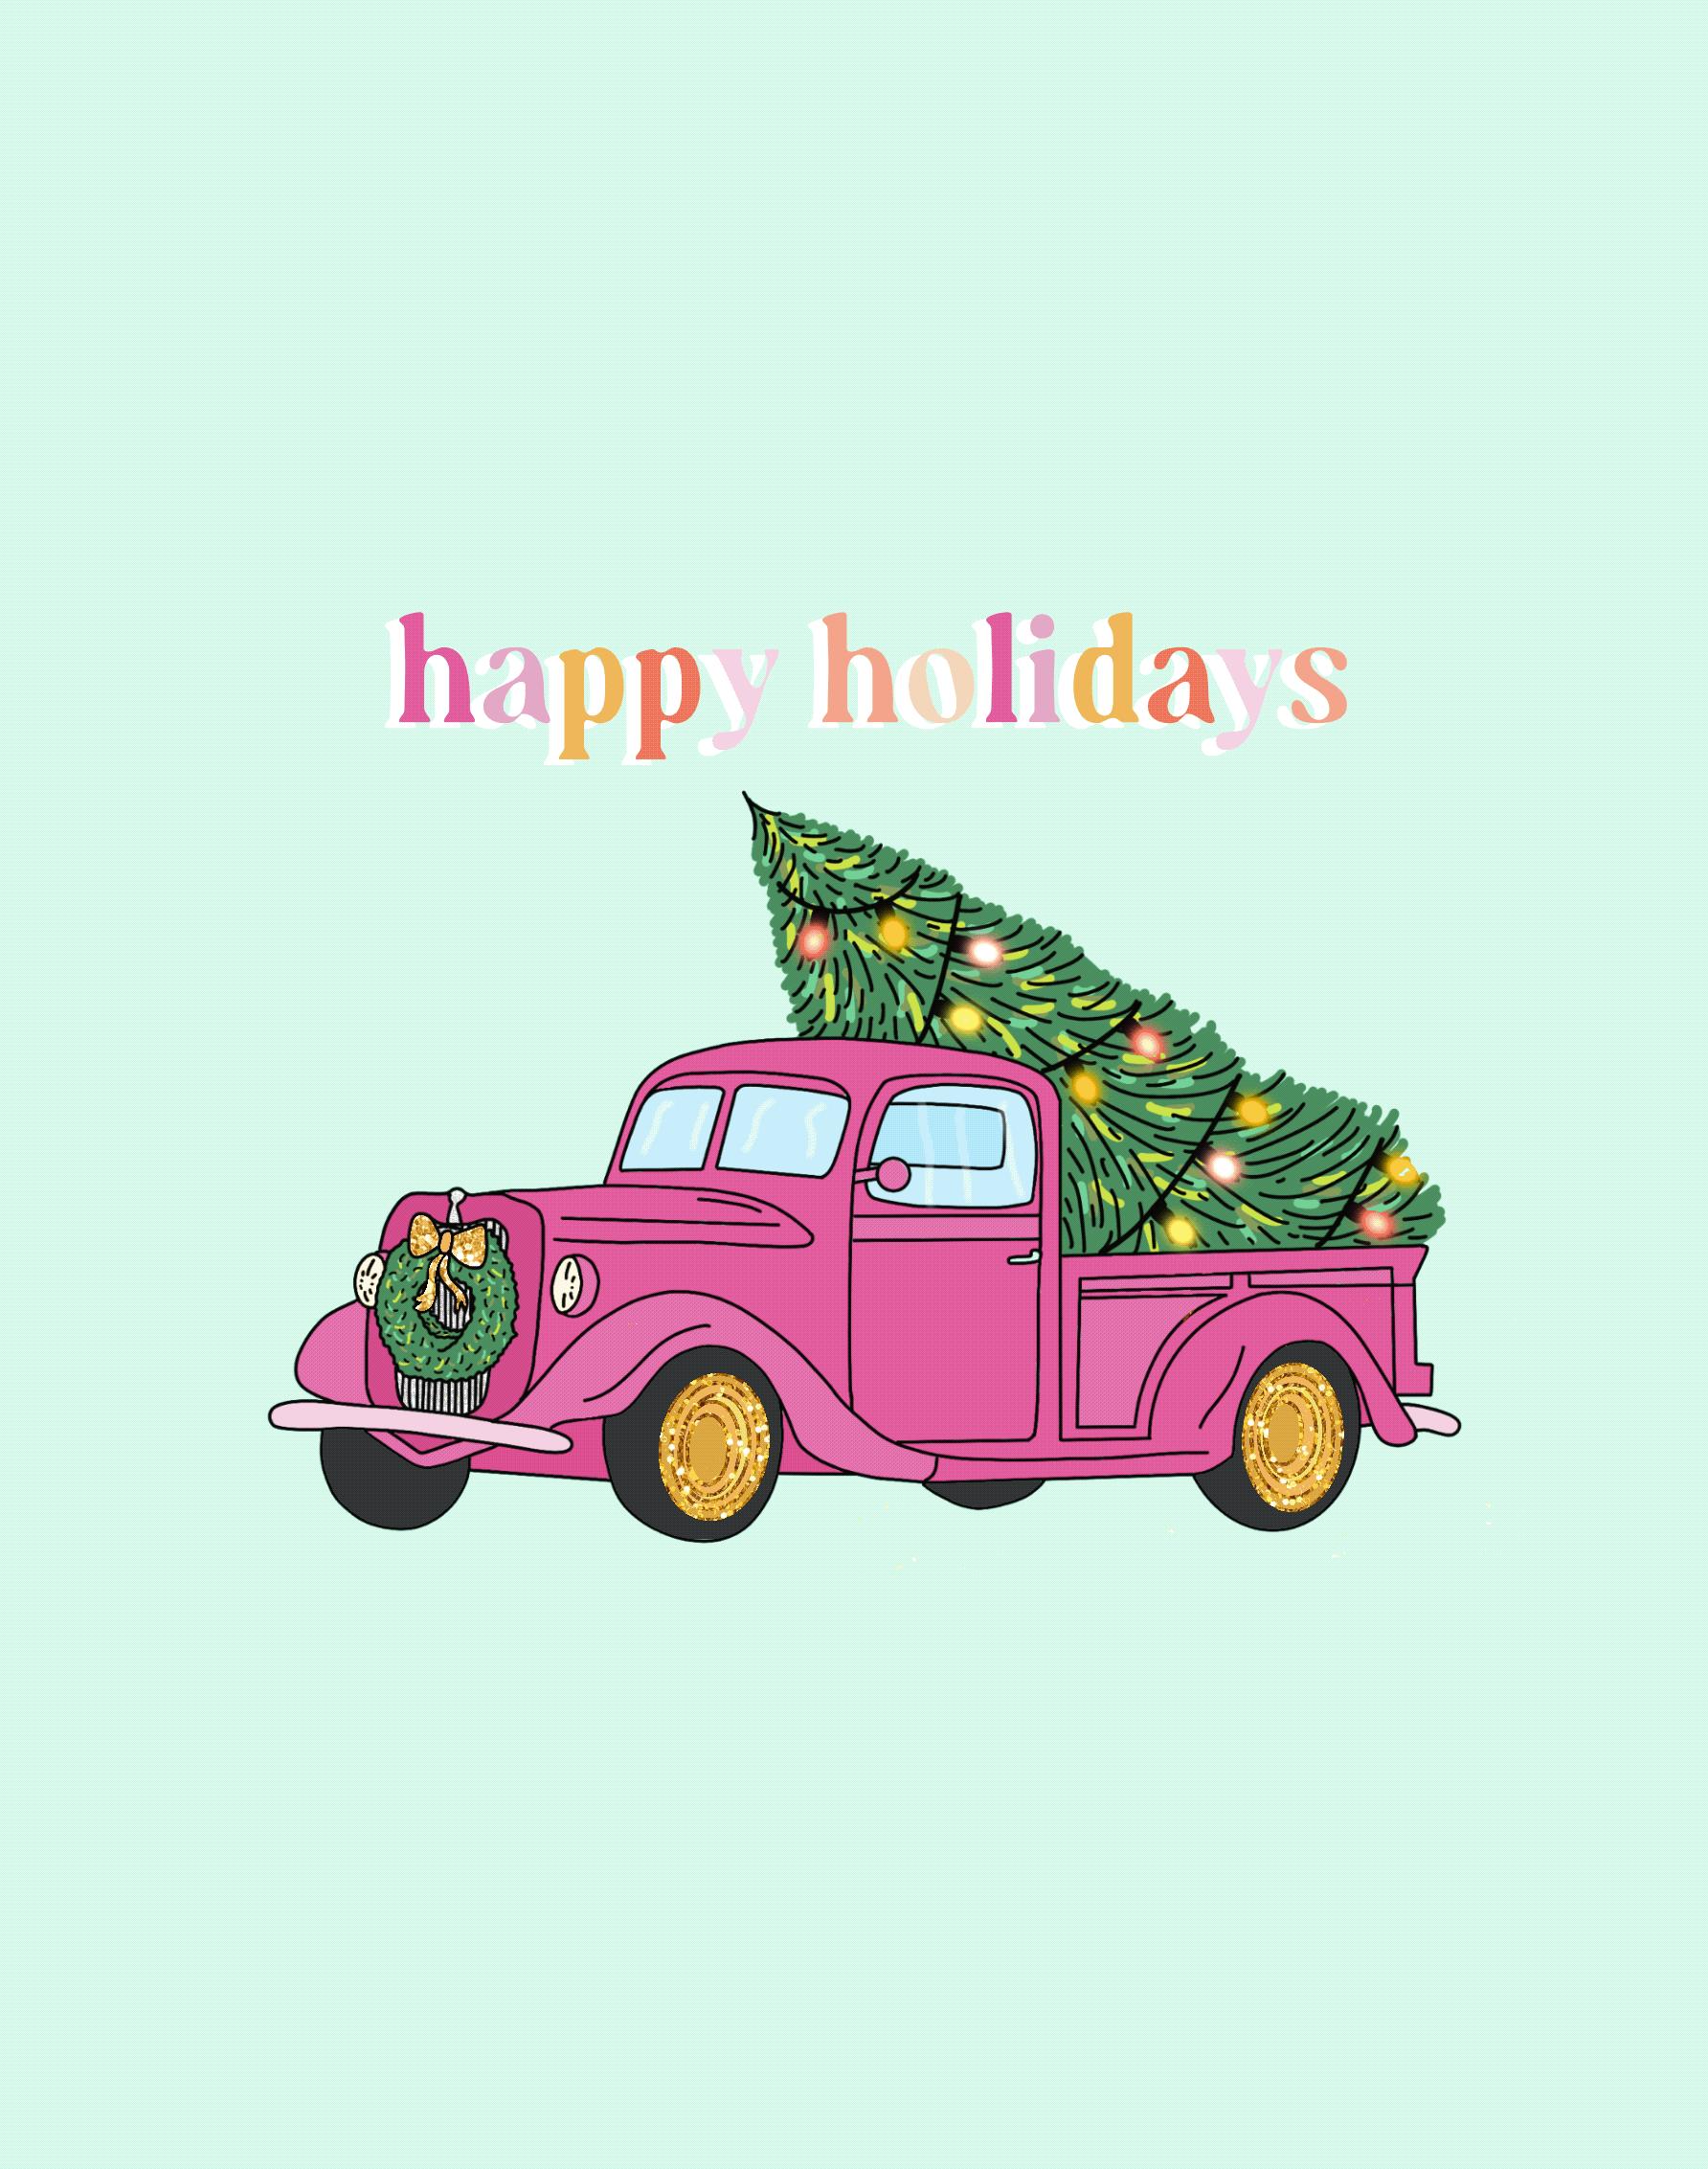 Pink Christmas Tree Truck Illustration fun girly glitter procreate animation pink procreate illustration procreate christmas tree christmas truck tree christmas illustration holiday illustration happy holidays holidays pink christmas christmas truck